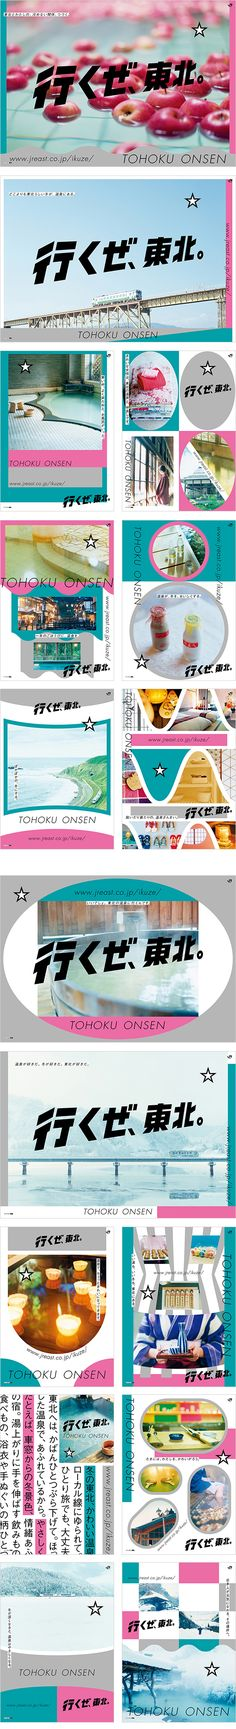 JR東日本:行くぜ、東北。2012 冬 Ad Layout, Print Layout, Book Layout, Layout Design, Web Design, Japan Design, Book Design, Cover Design, Photos Colage